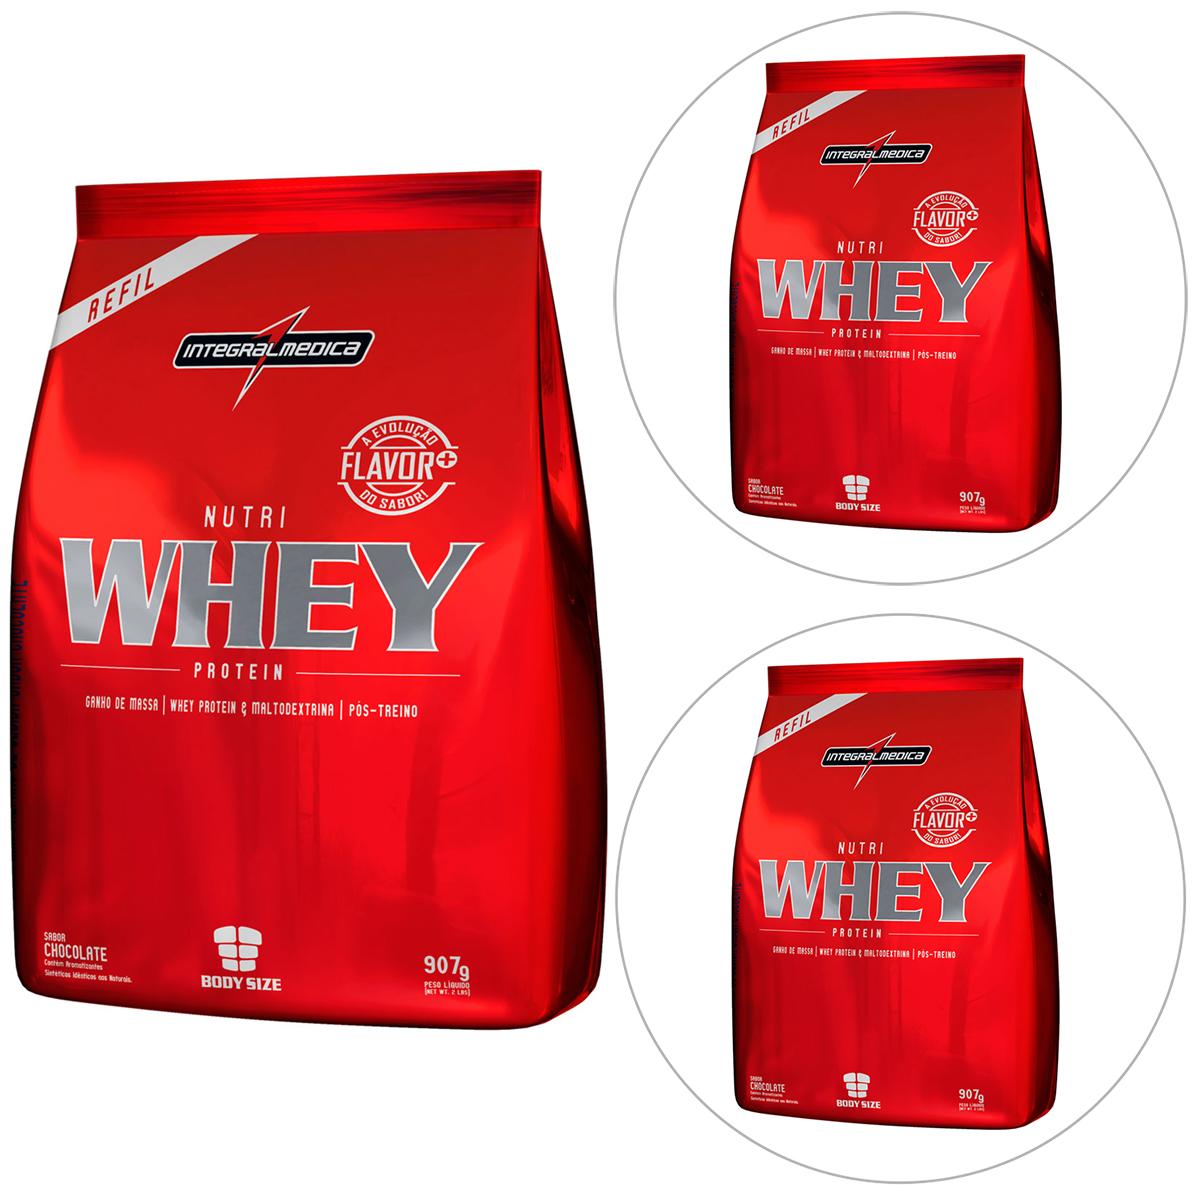 kit whey integral - 3 Whey Protein 907g - IntegralMédica - R$99,90